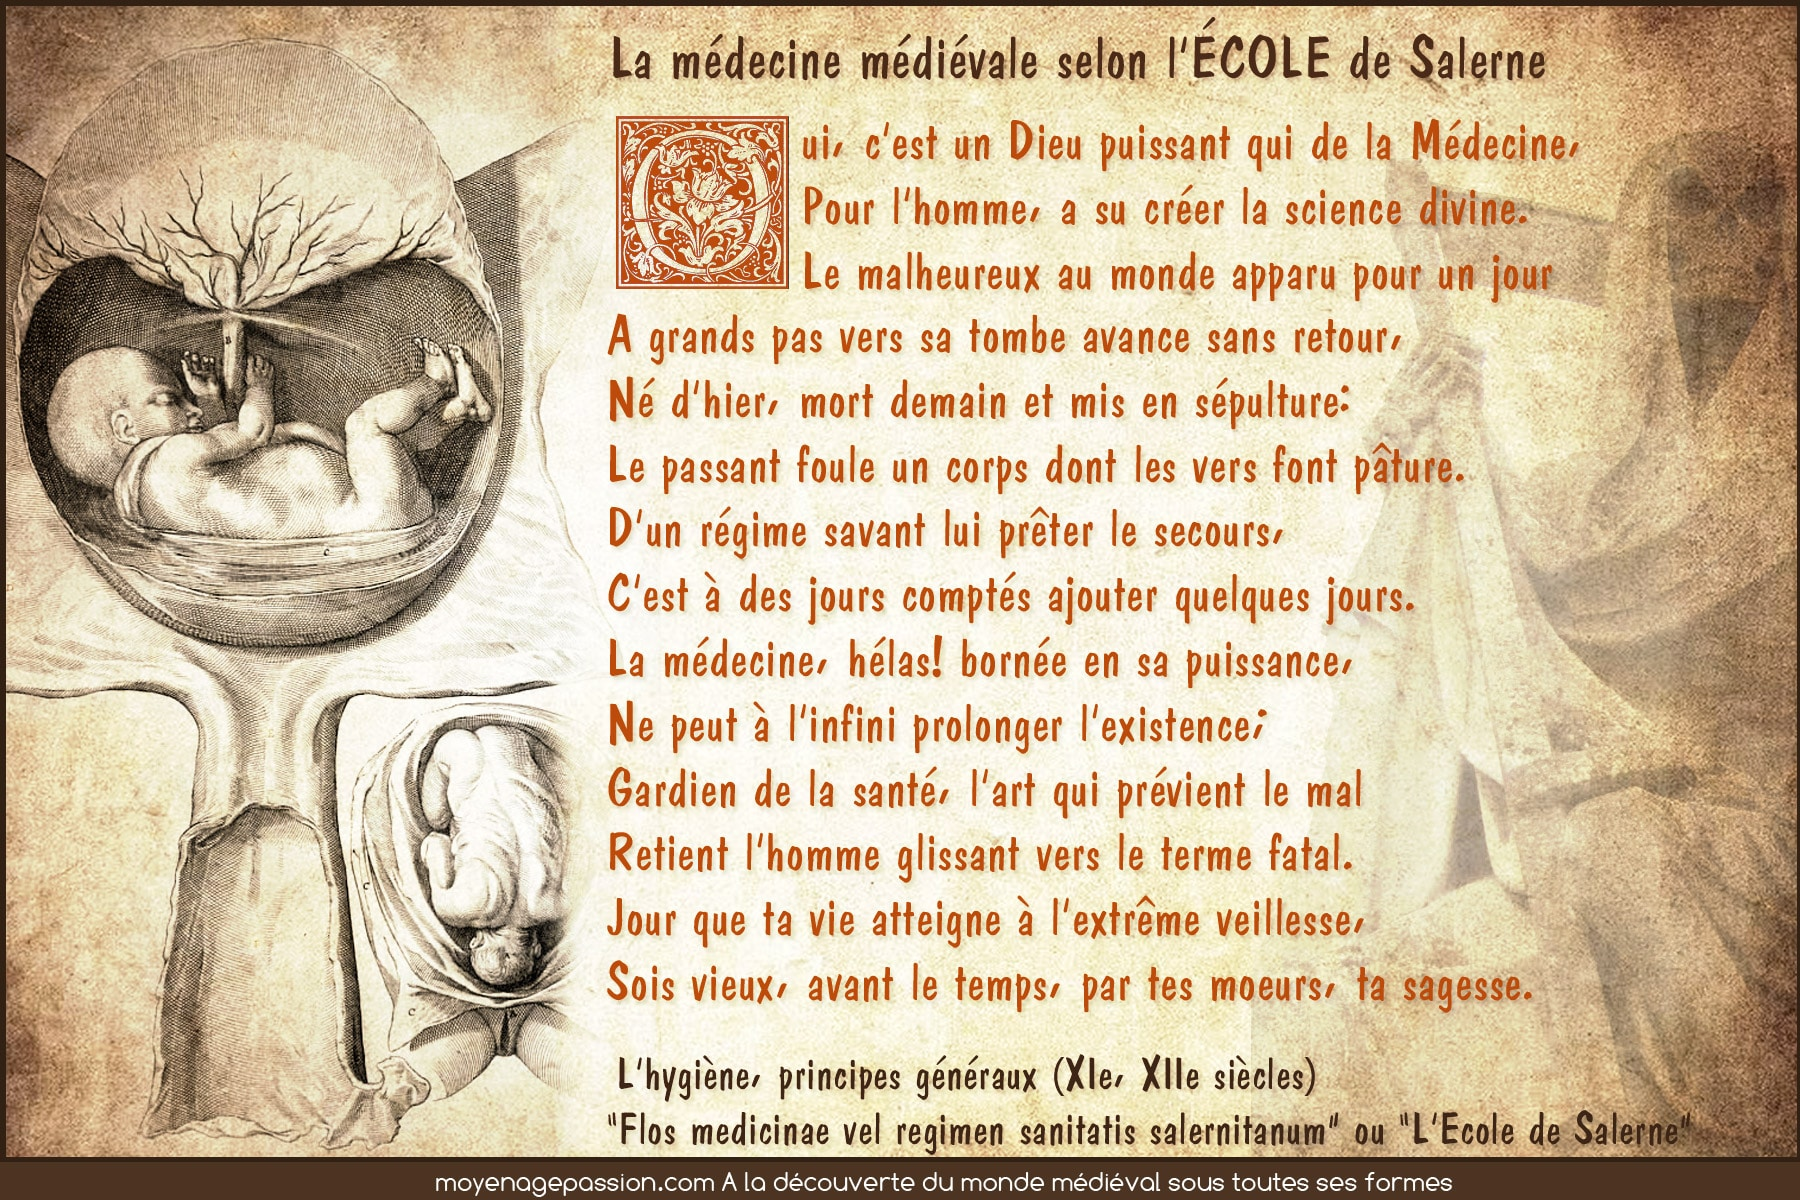 ecole_salerne_citations_medecine_medievales_humilite_science_medicale_hygiene_principes_generaux_moyen-age_central